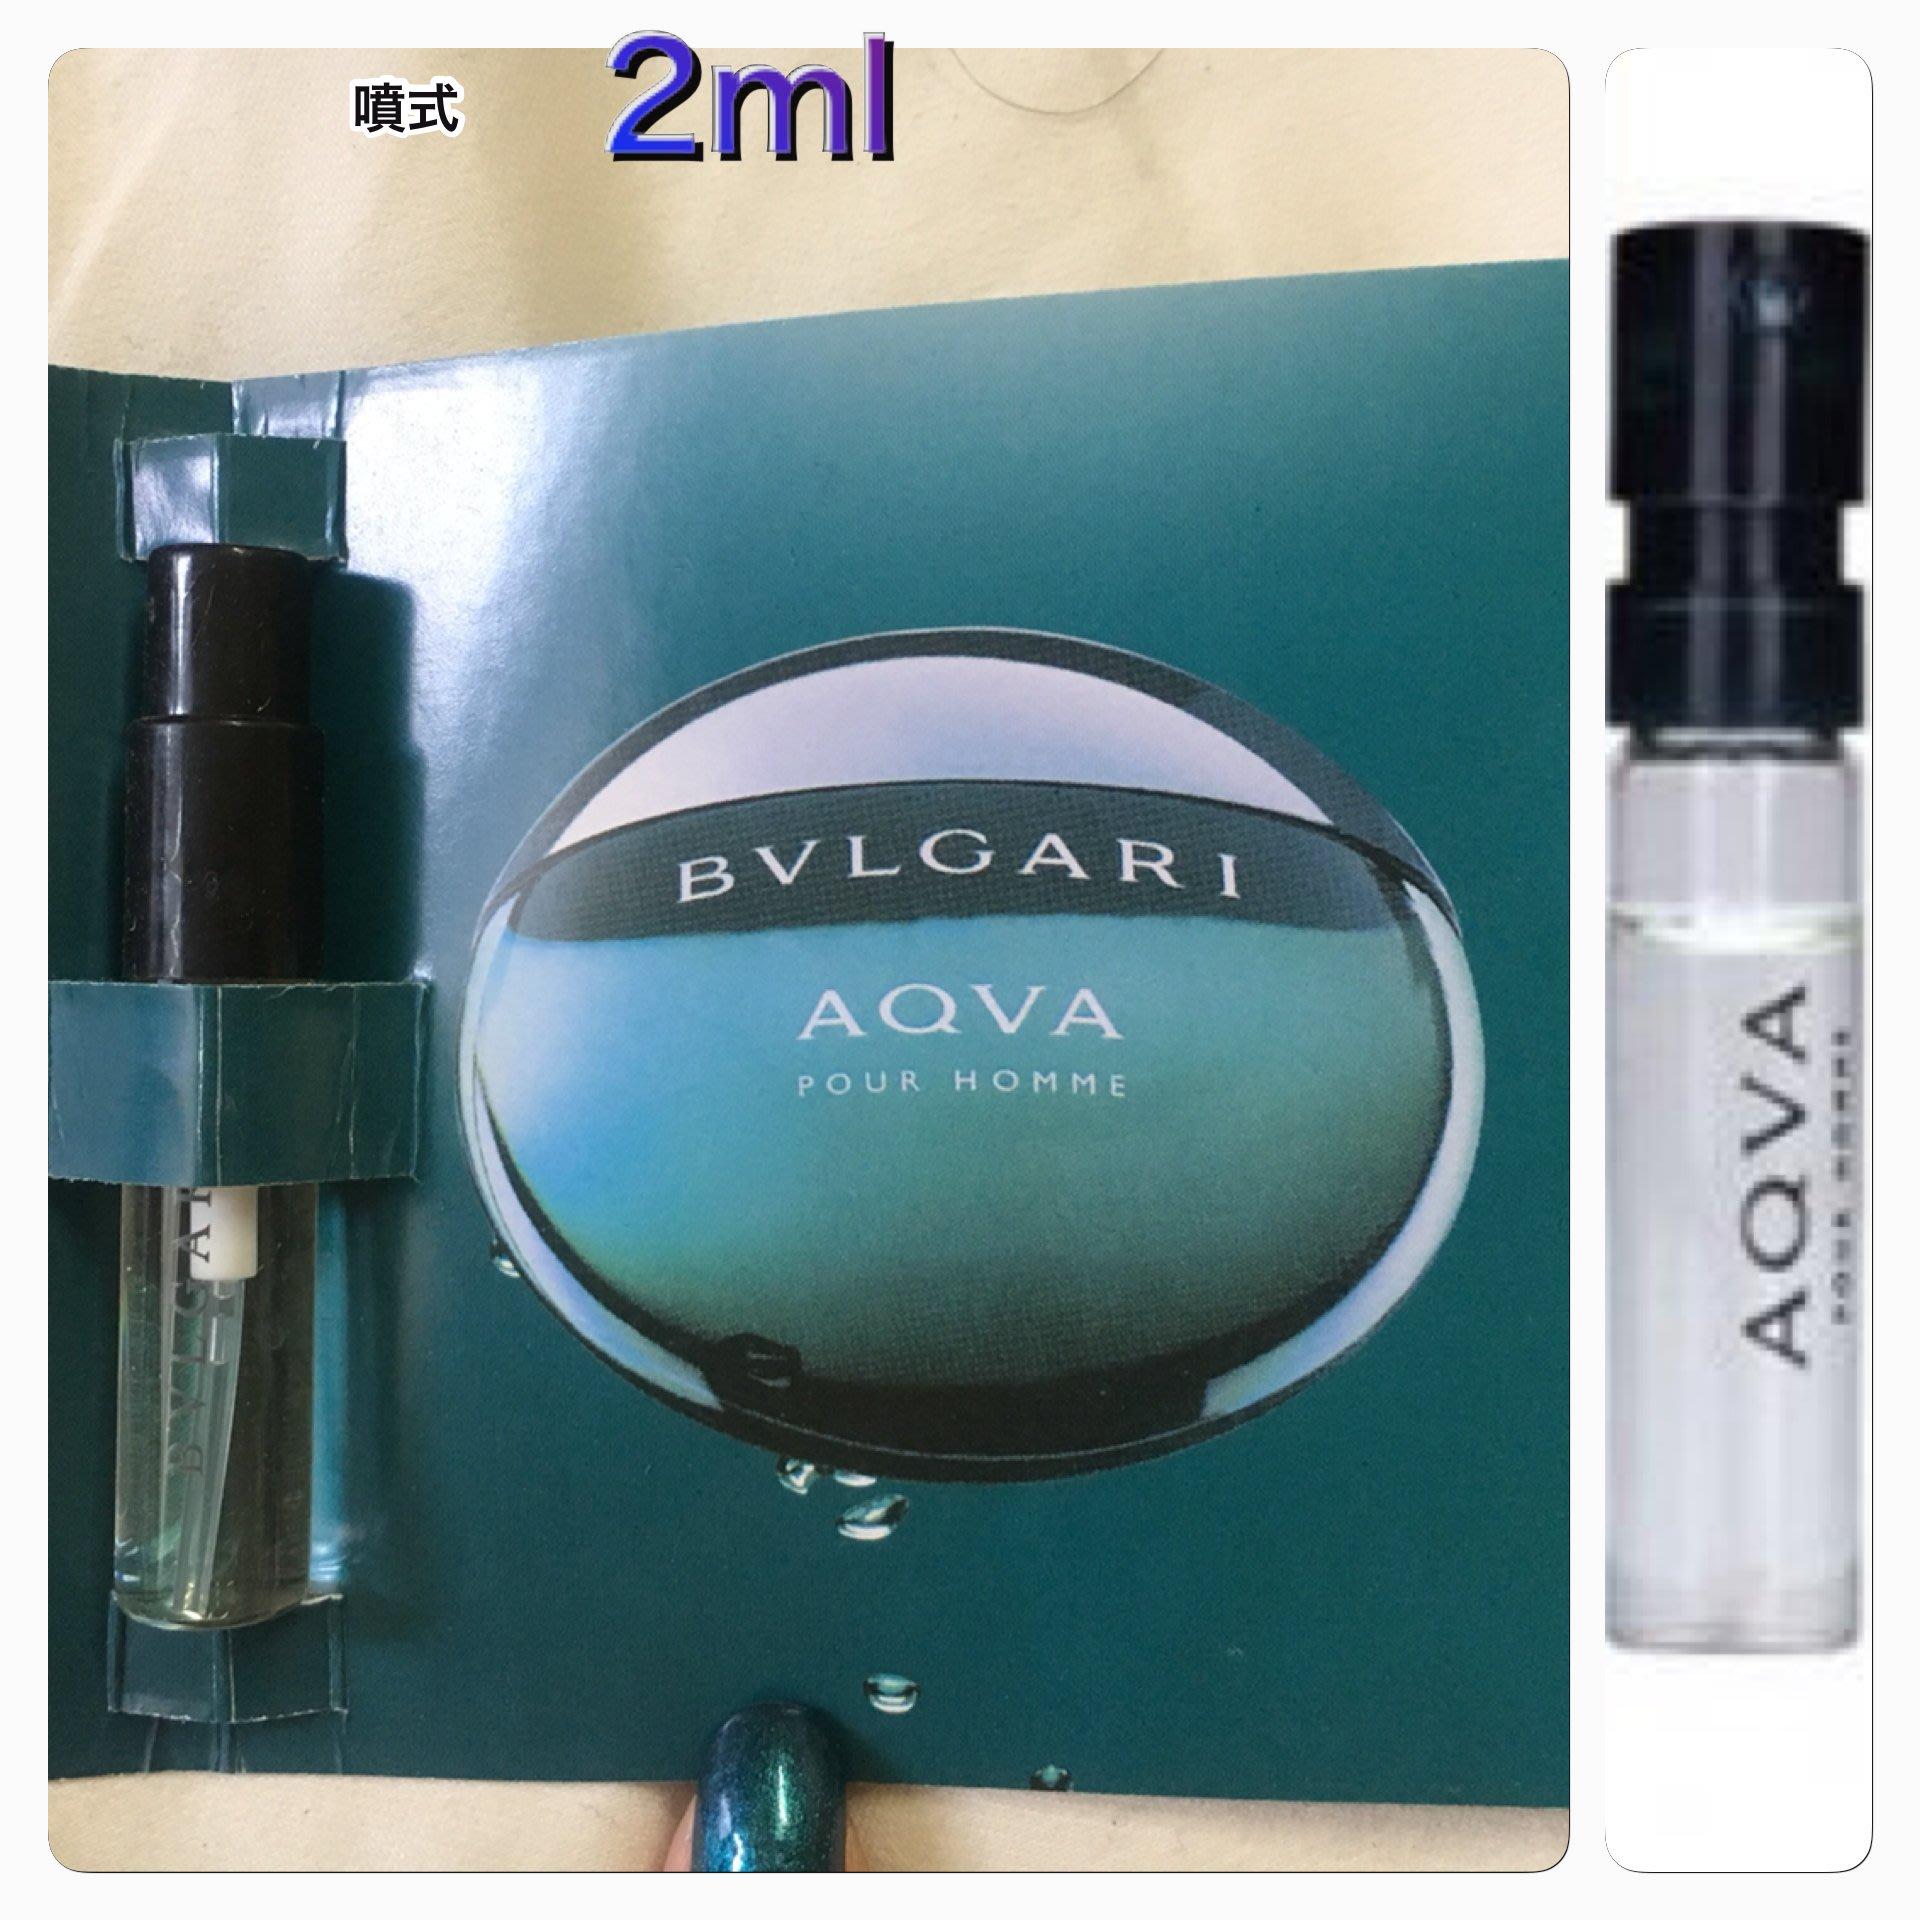 BVLGARI 寶格麗 原廠針管 AQVA Pour Homme 寶格麗 水能量男性淡香水2ml